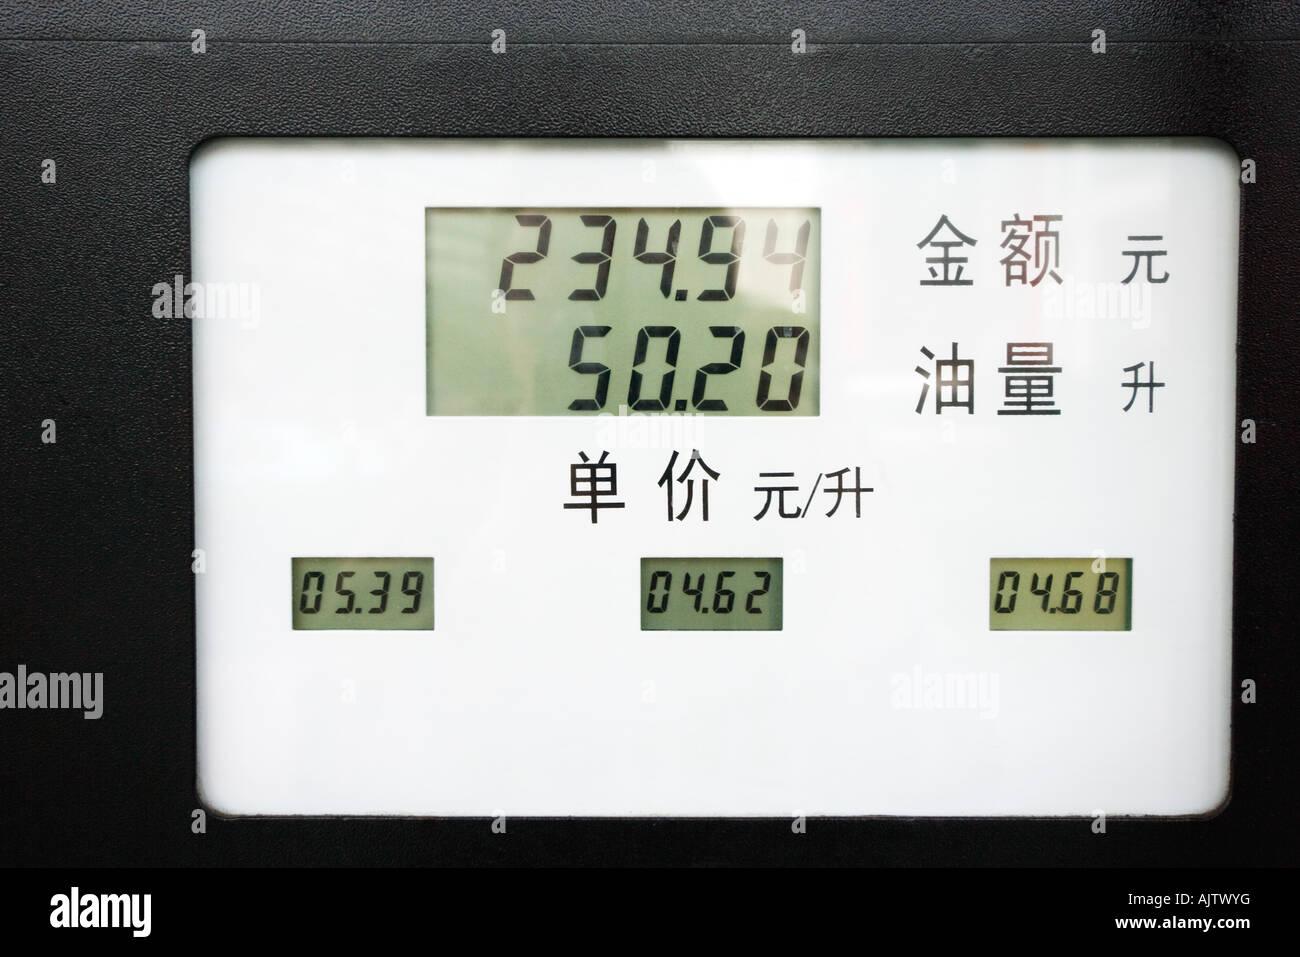 Digital display on Chinese gas pump - Stock Image